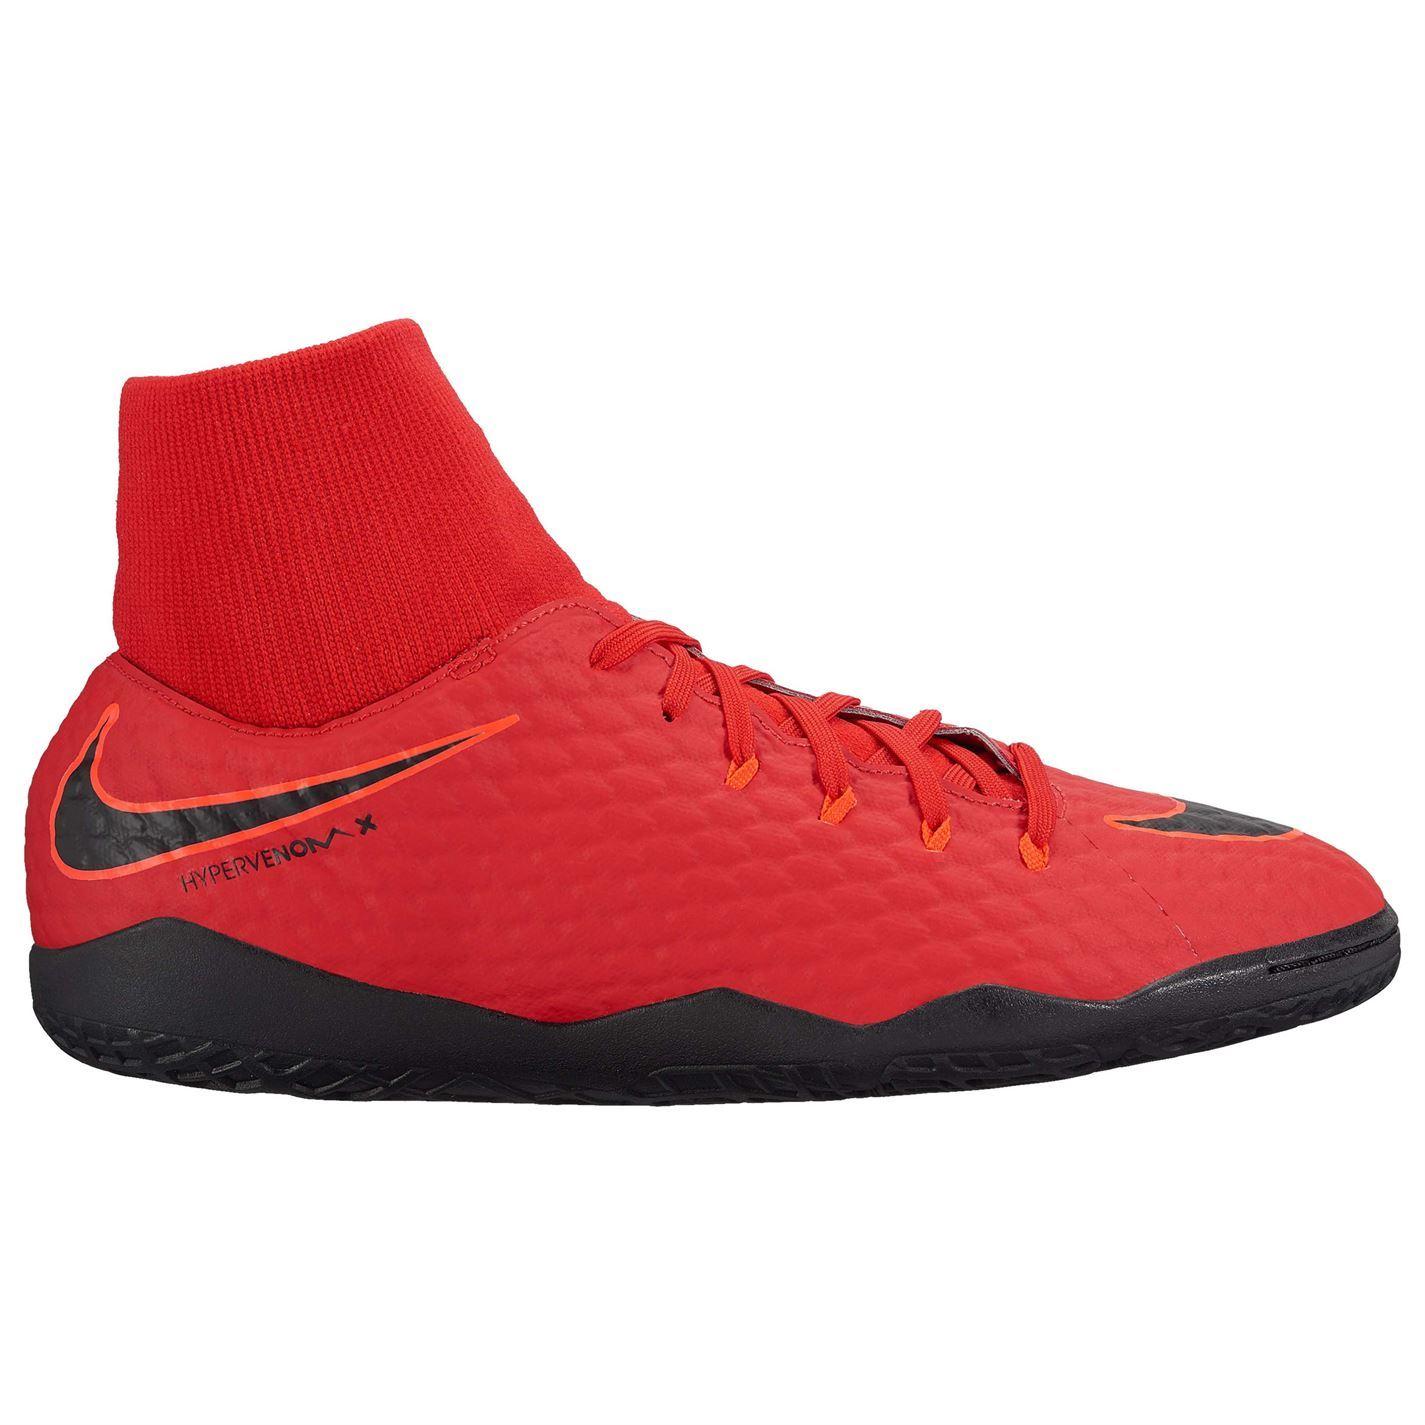 4dde3c18a66a ... Nike Hypervenom Phelon DF Indoor Football Trainers Mens Red Soccer  Futsal Shoes ...